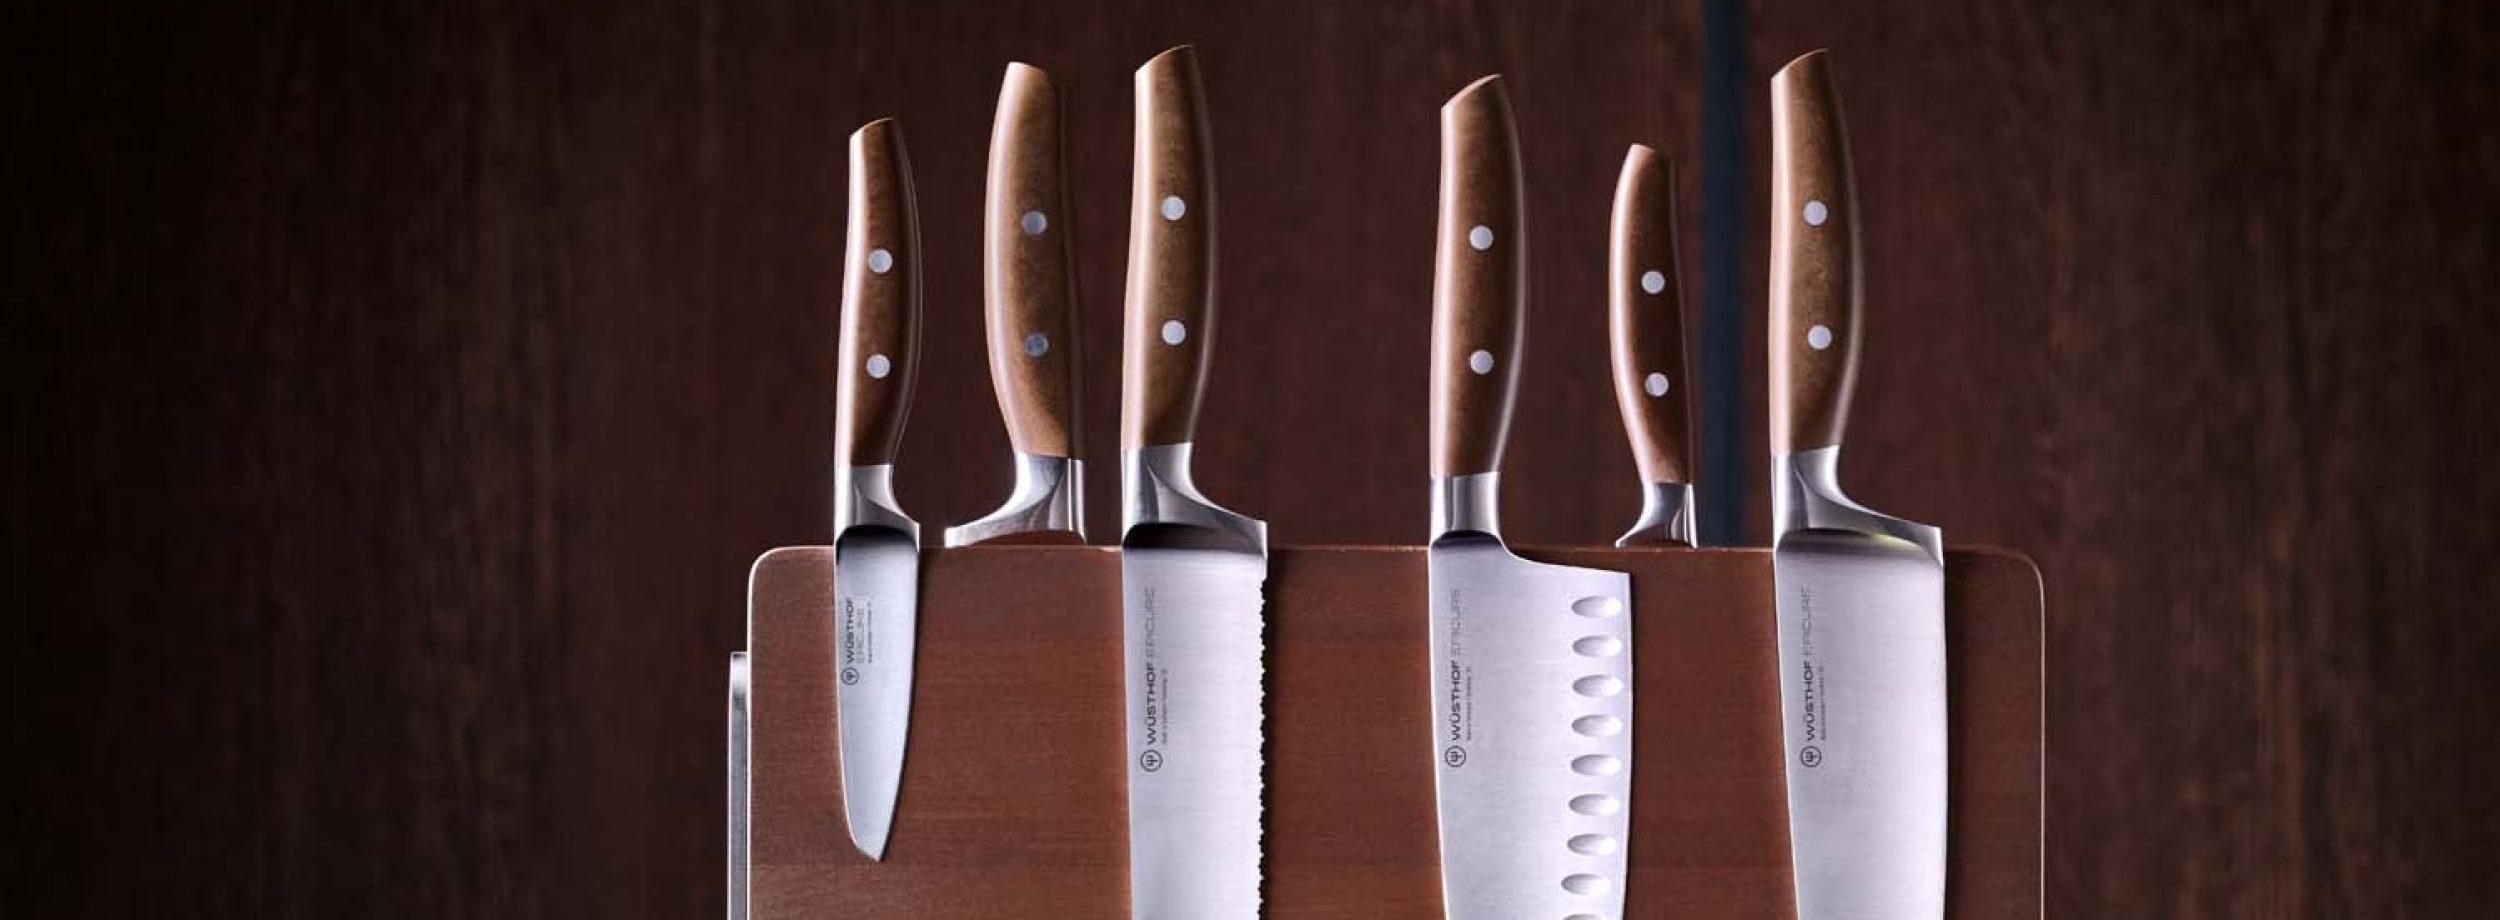 Messerblöcke & Messer-Sets aus Solingen